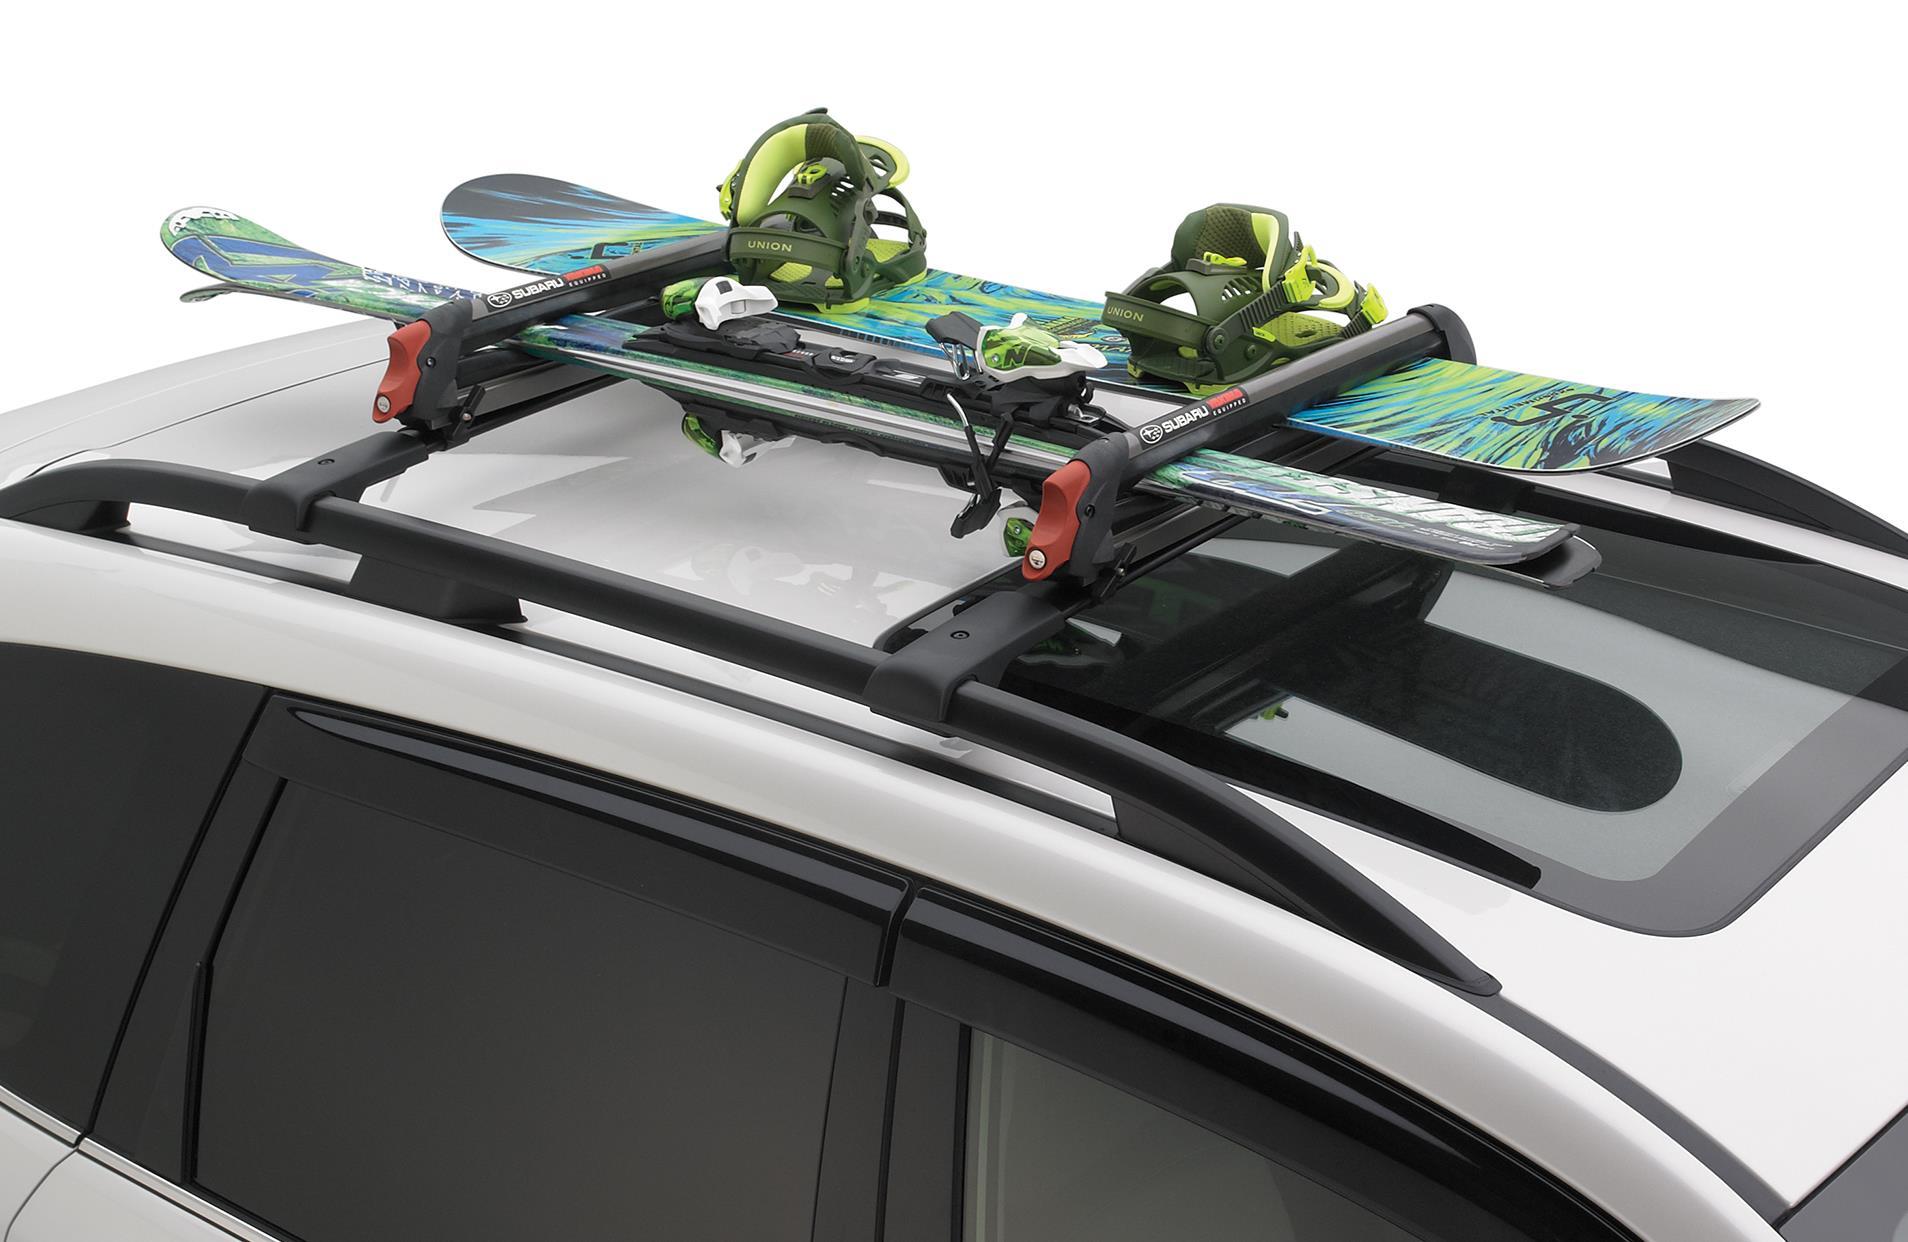 2015 subaru impreza ski carrier with foam pad yakima. Black Bedroom Furniture Sets. Home Design Ideas